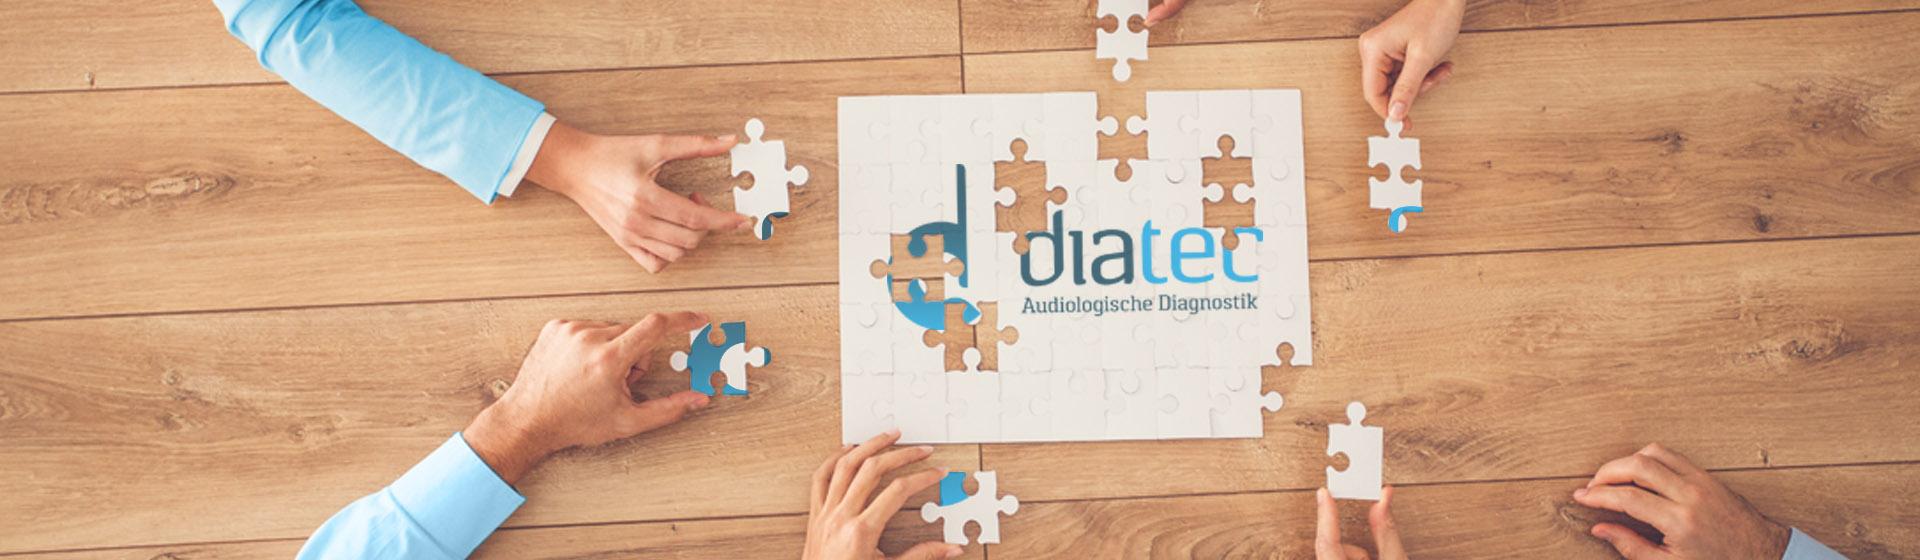 Karriere in der Medizintechnik mit Diatec Diagnostics